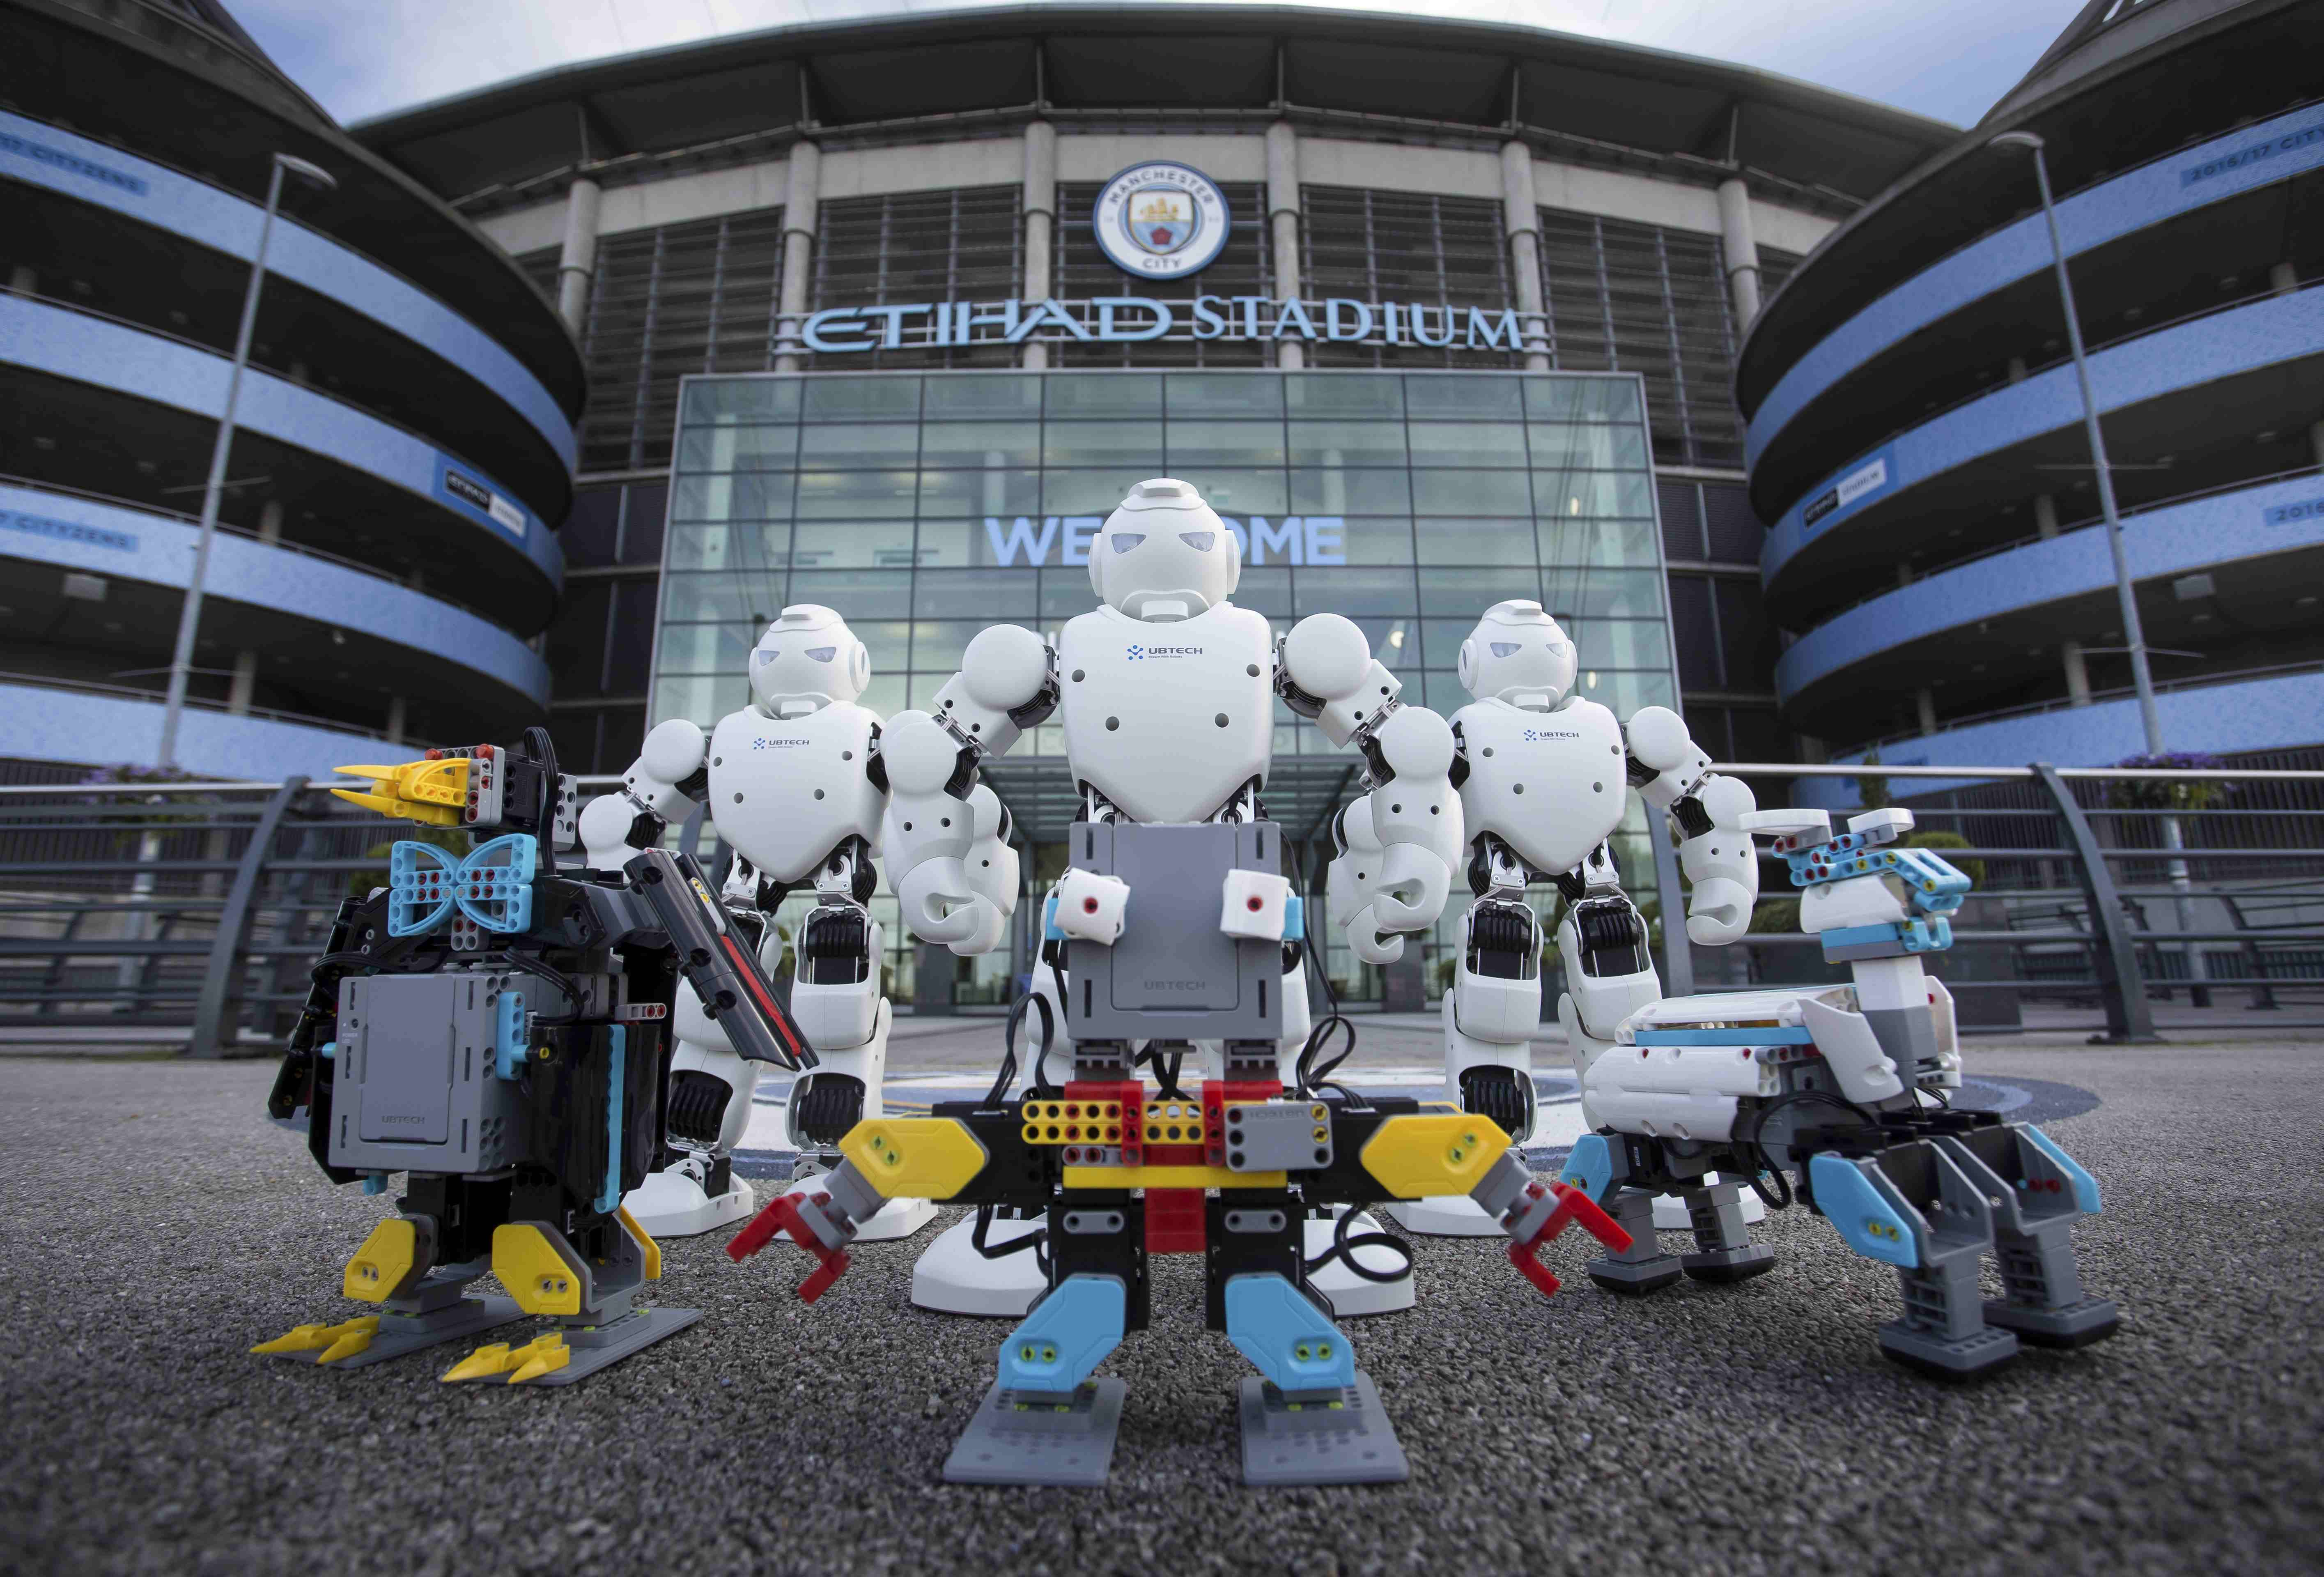 I robot della Ubtech davanti all'Etihad Stadium (Fonte: www.mancity.com)